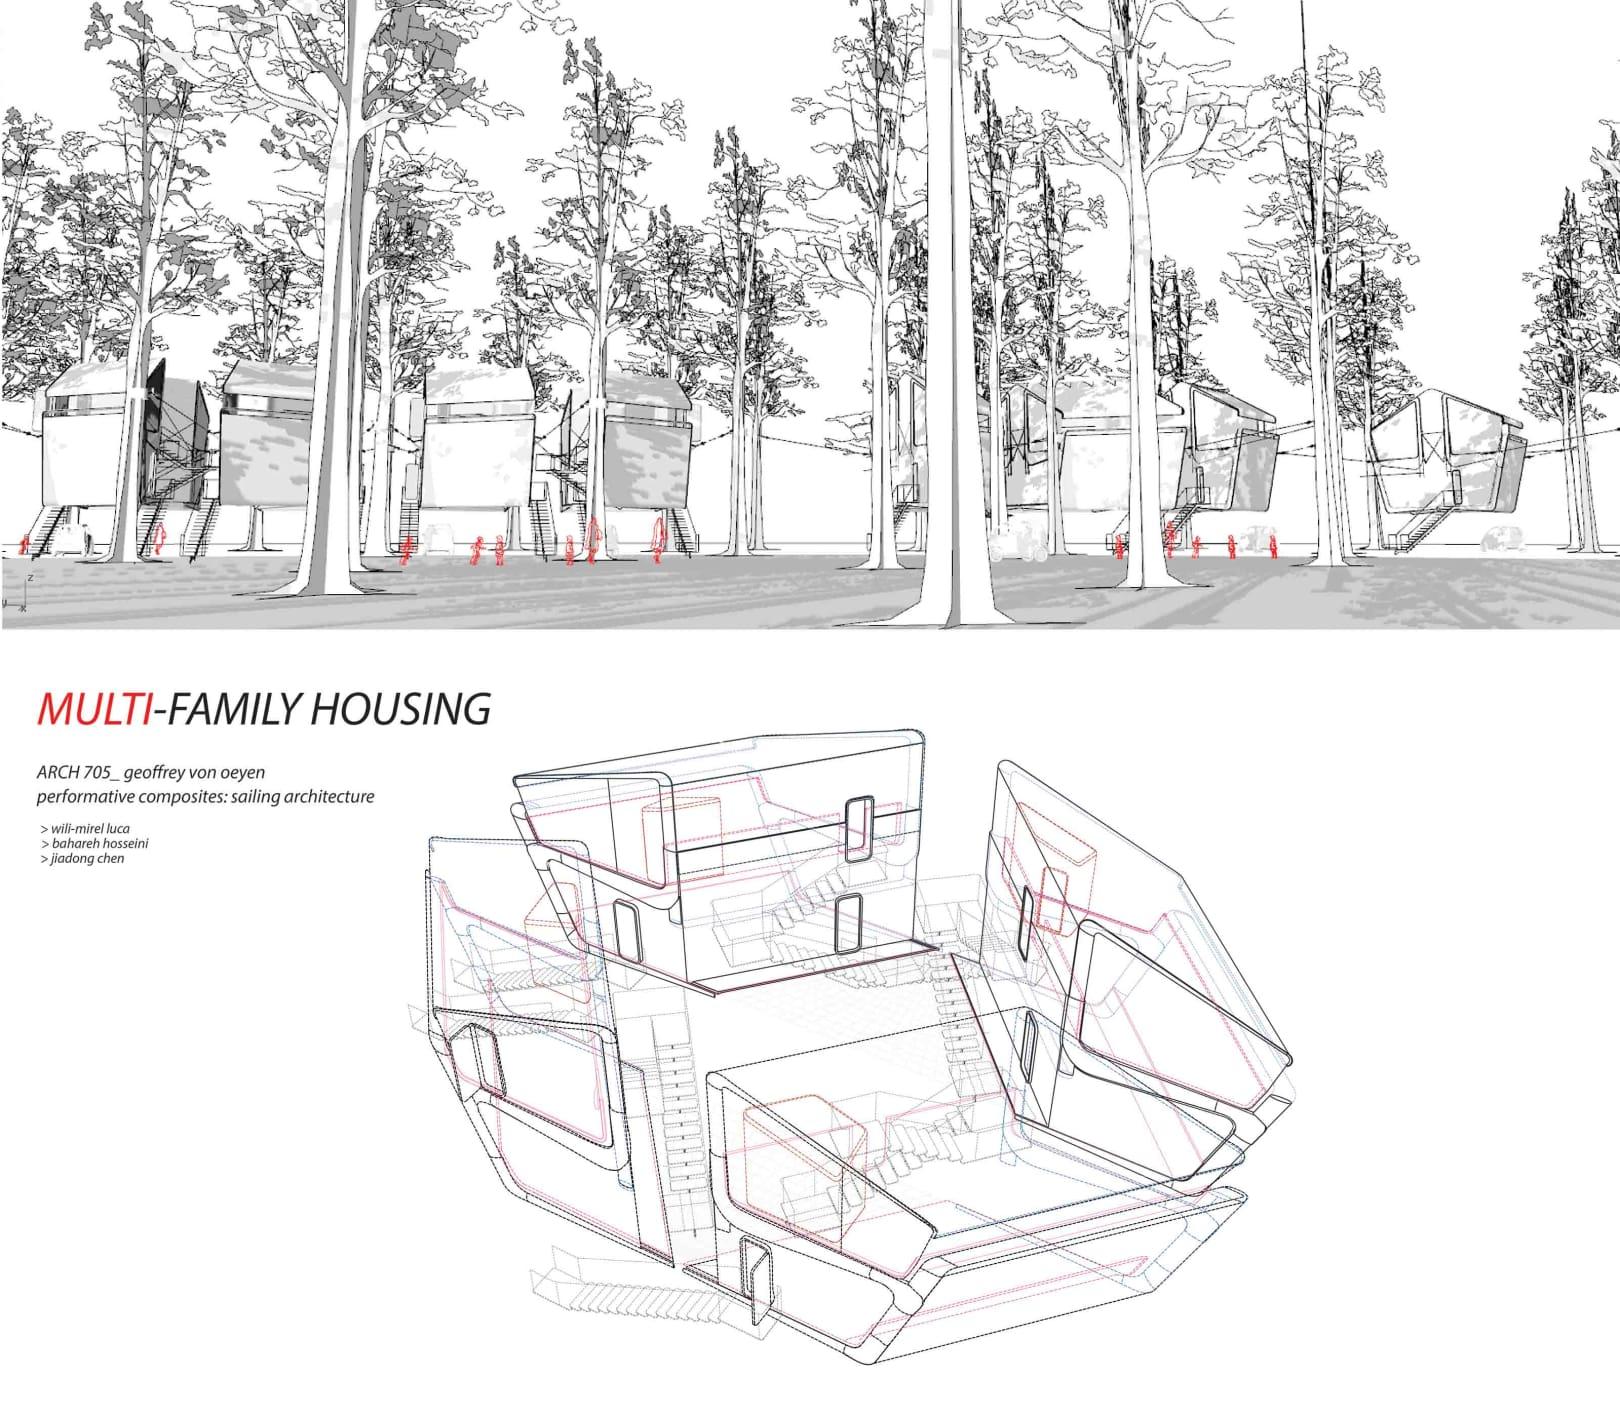 One Design - sailing architecture